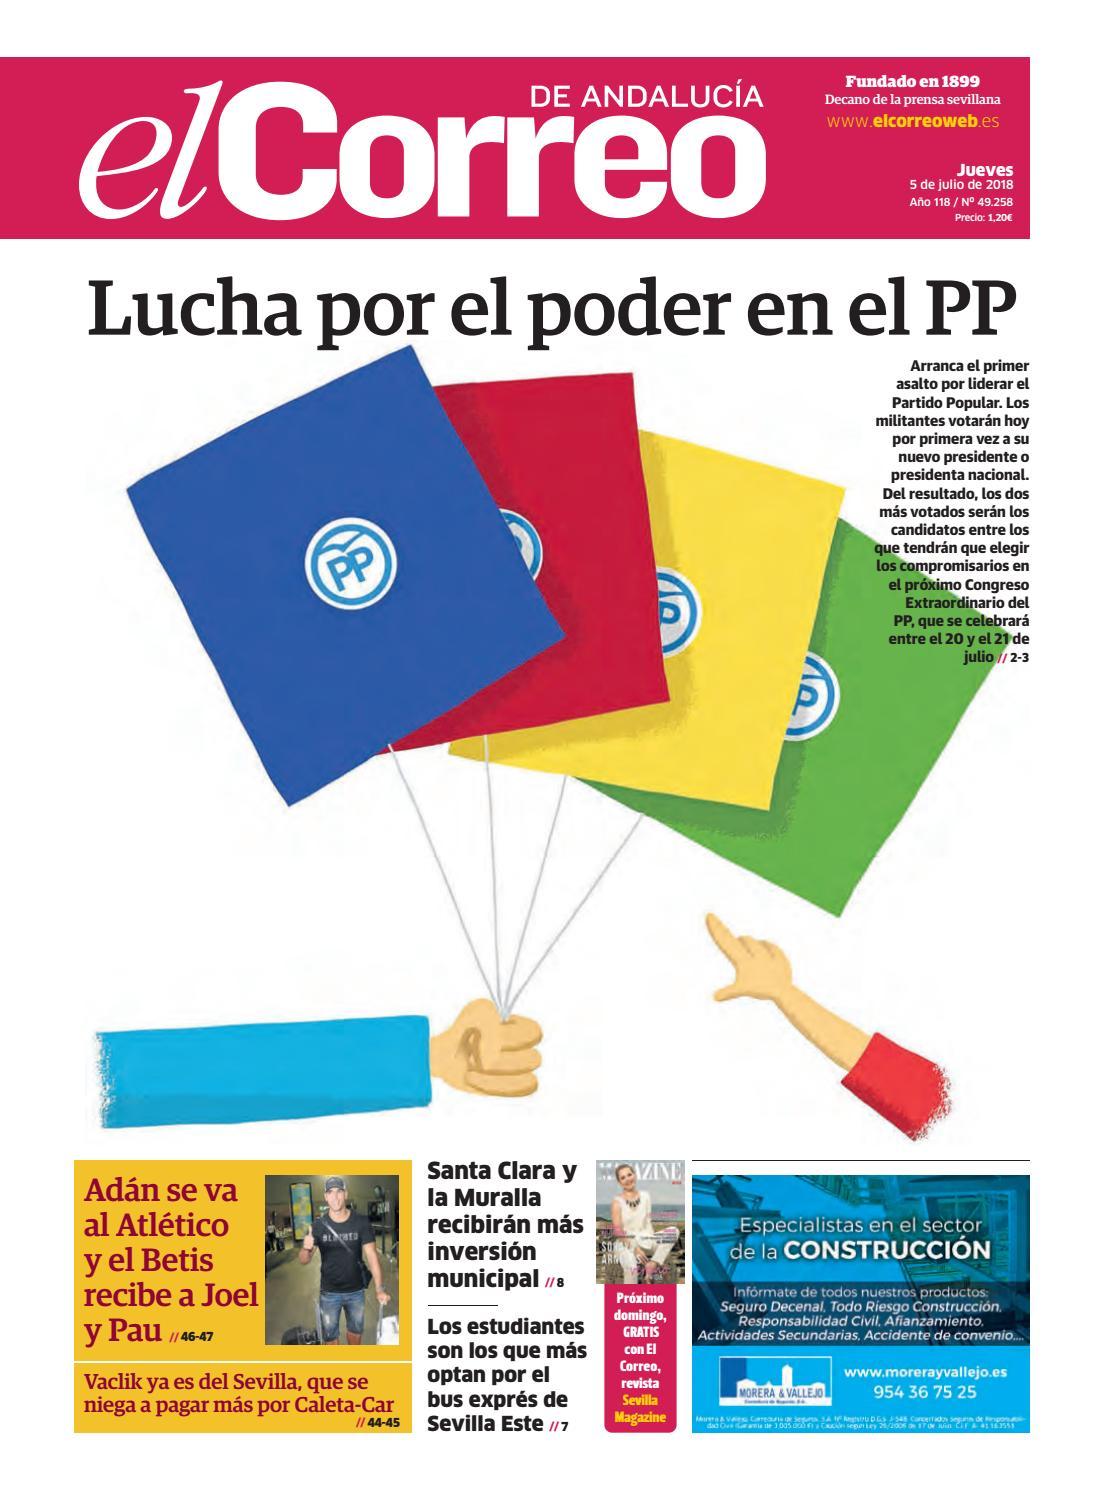 d9fa5594fef55 05.07.2018 El Correo de Andalucía by EL CORREO DE ANDALUCÍA S.L. - issuu